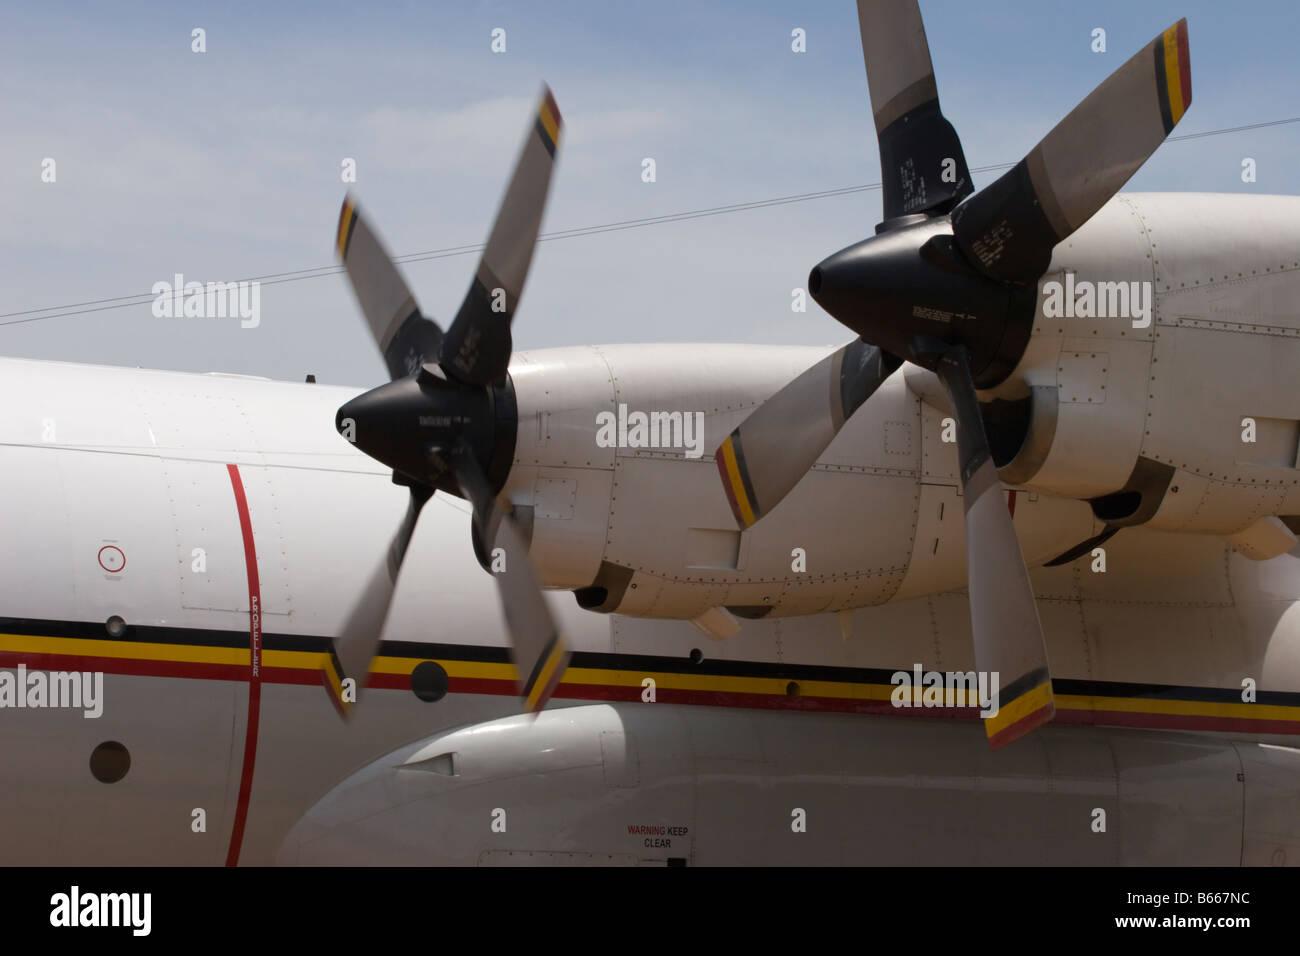 hercules aircraft locheed martin turboprop engines - Stock Image